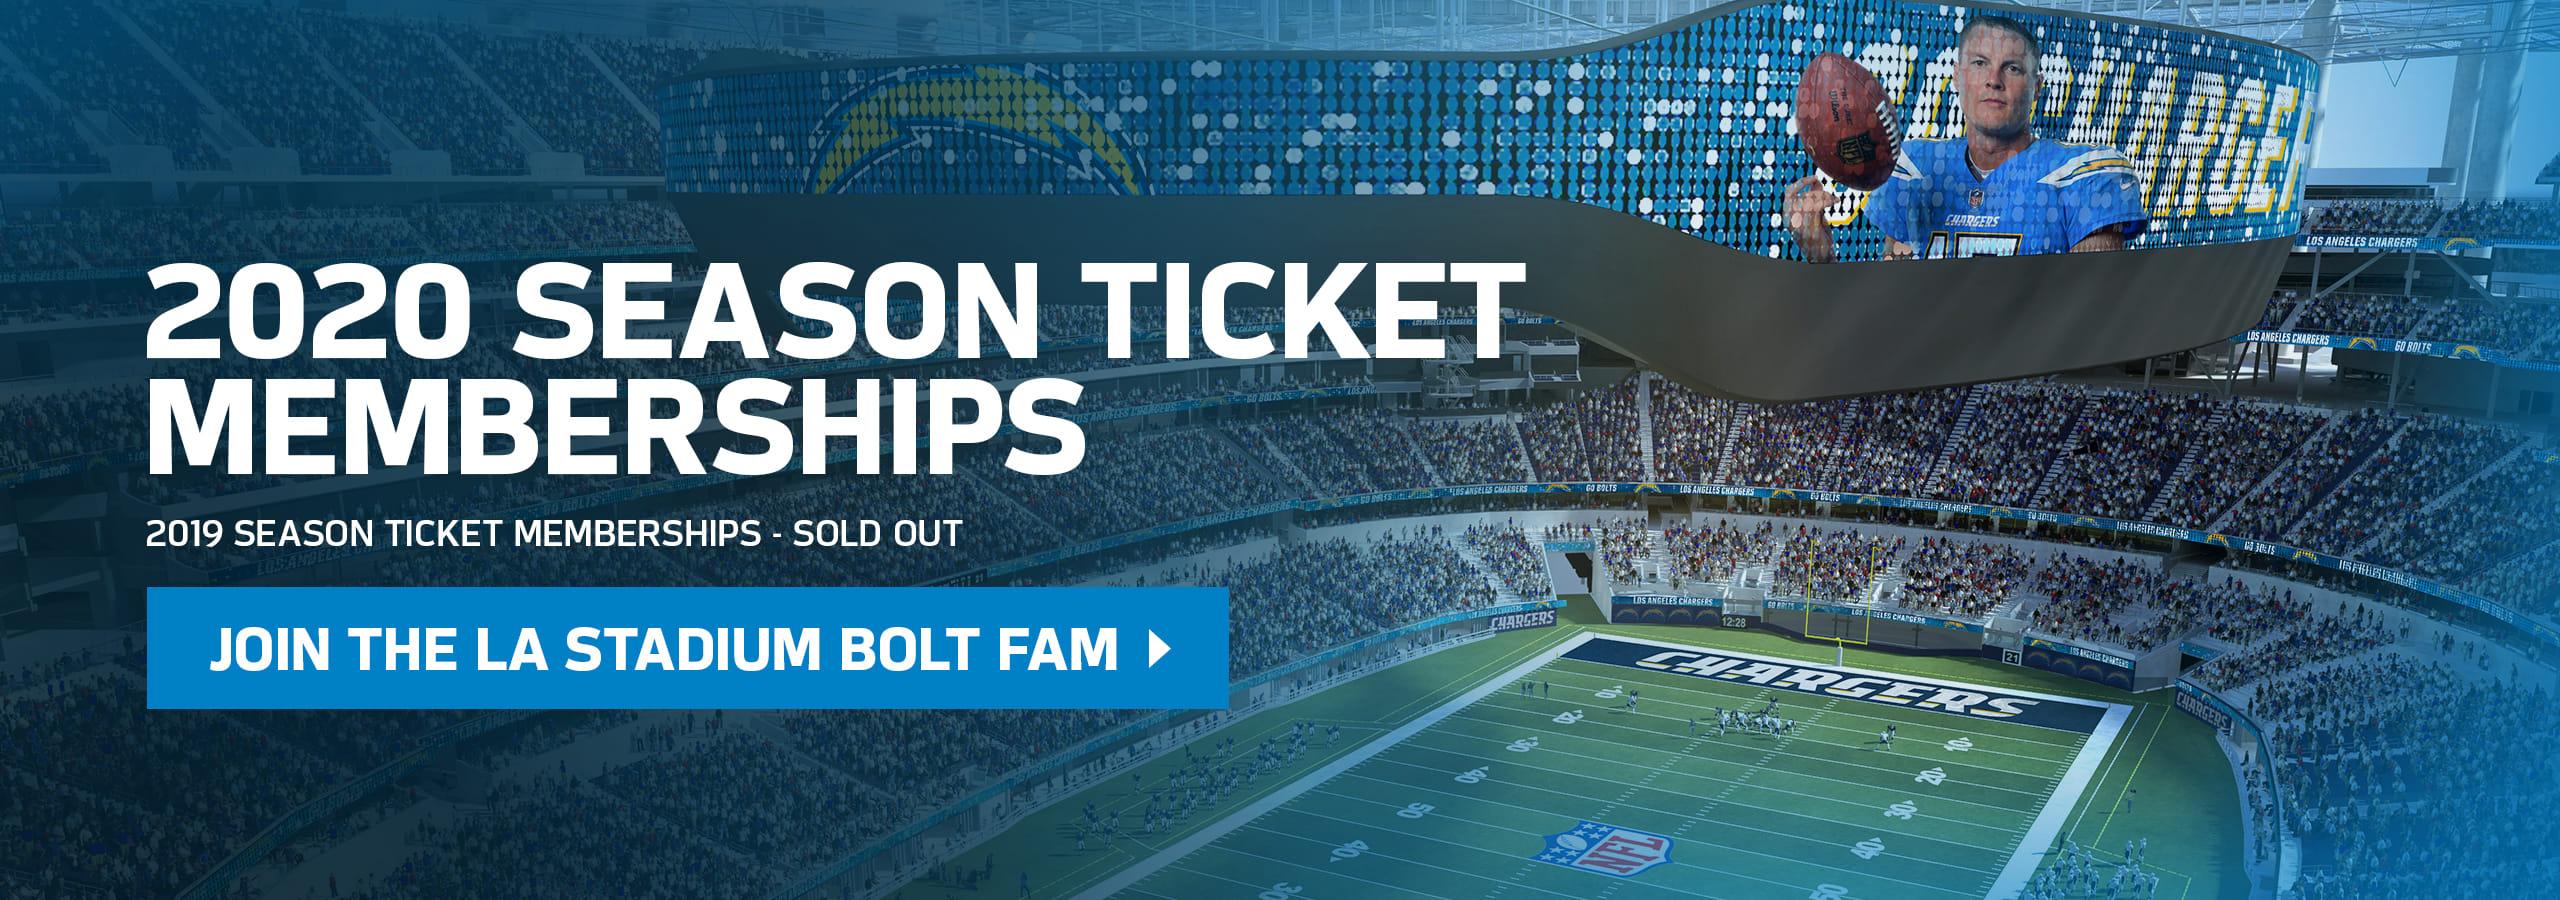 2020 Season Ticket Memberships: On Sale Now